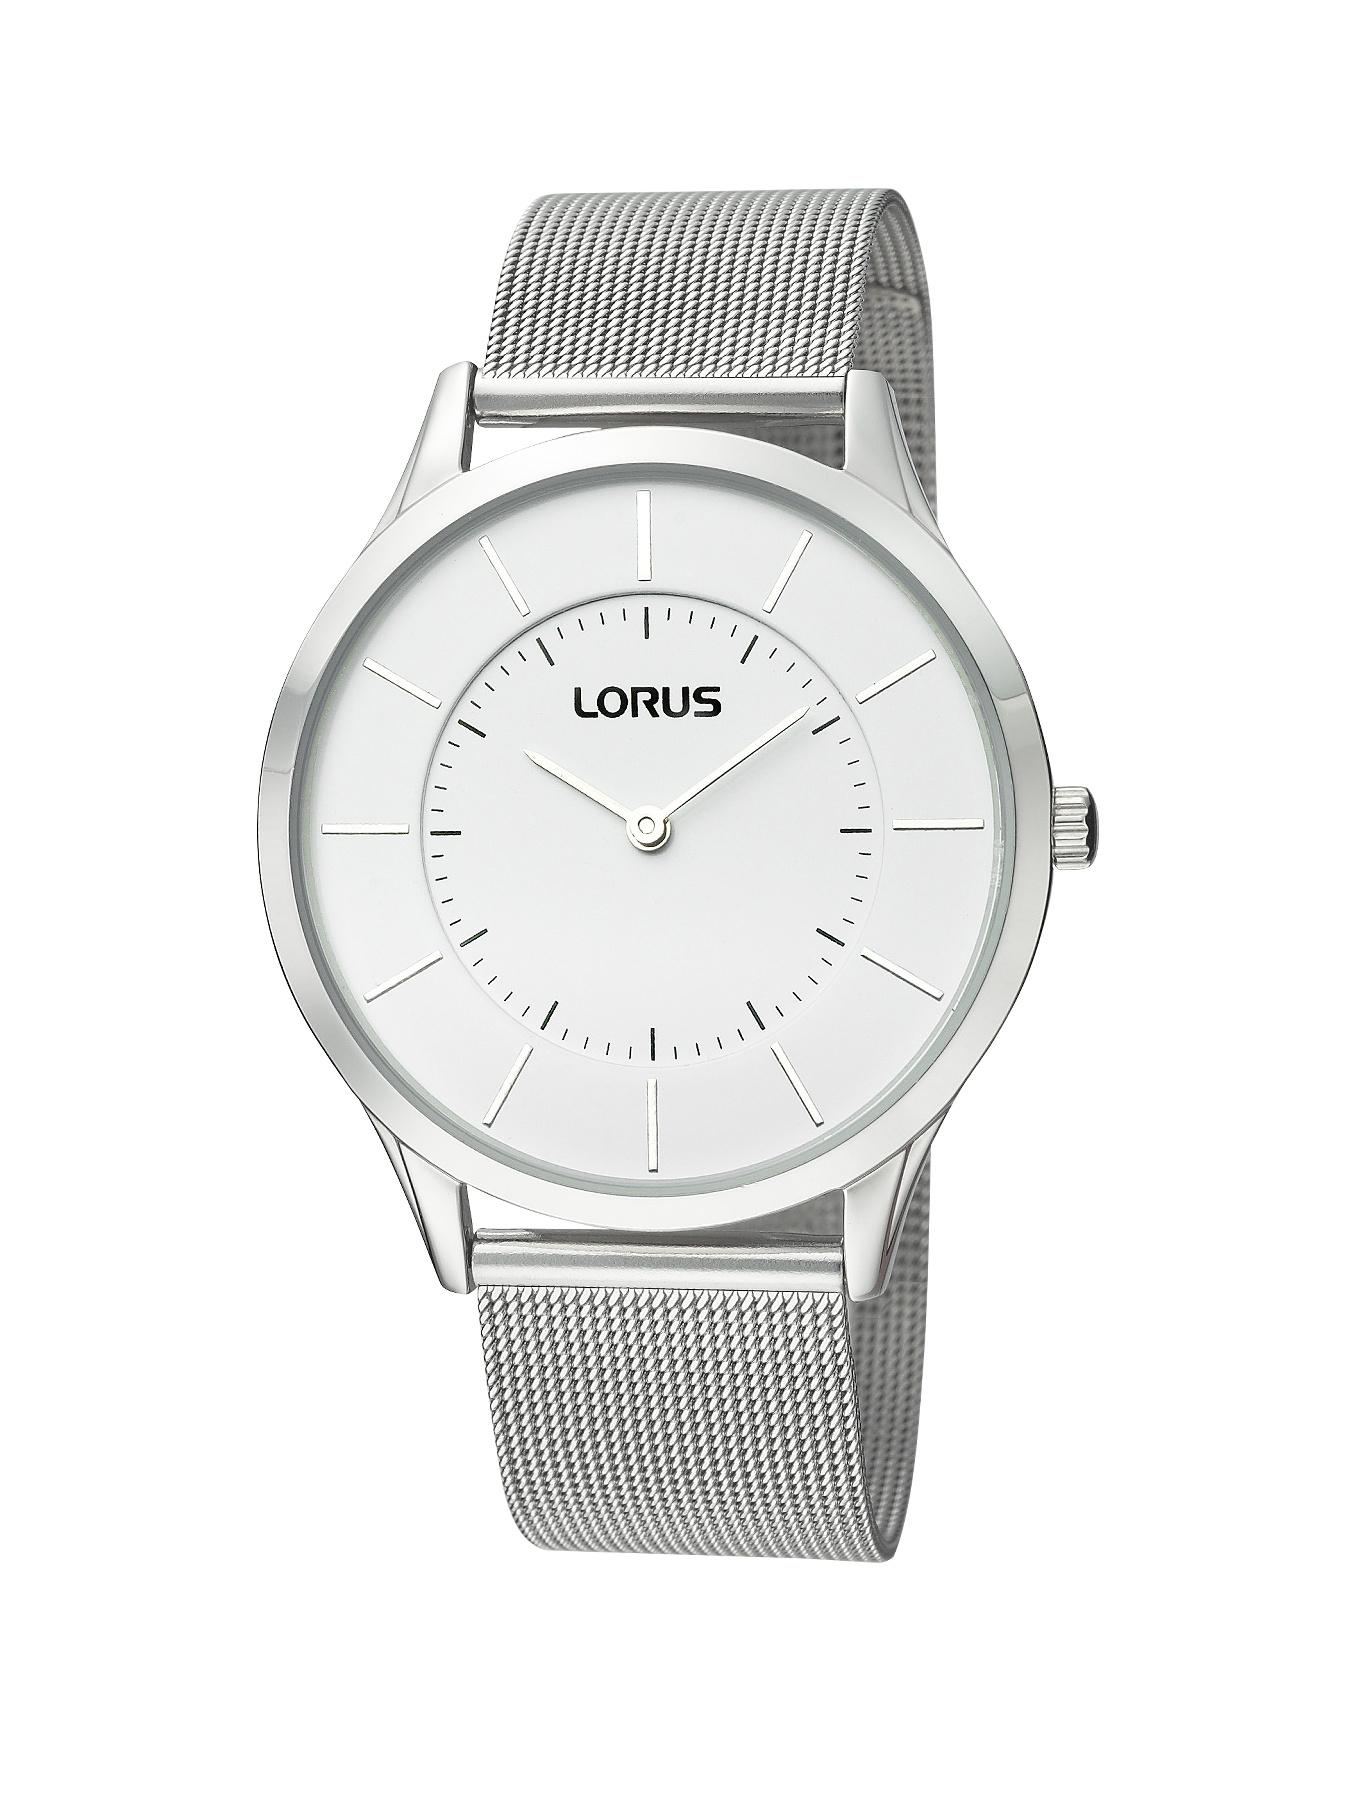 Lorus Silver Tone Unisex Watch